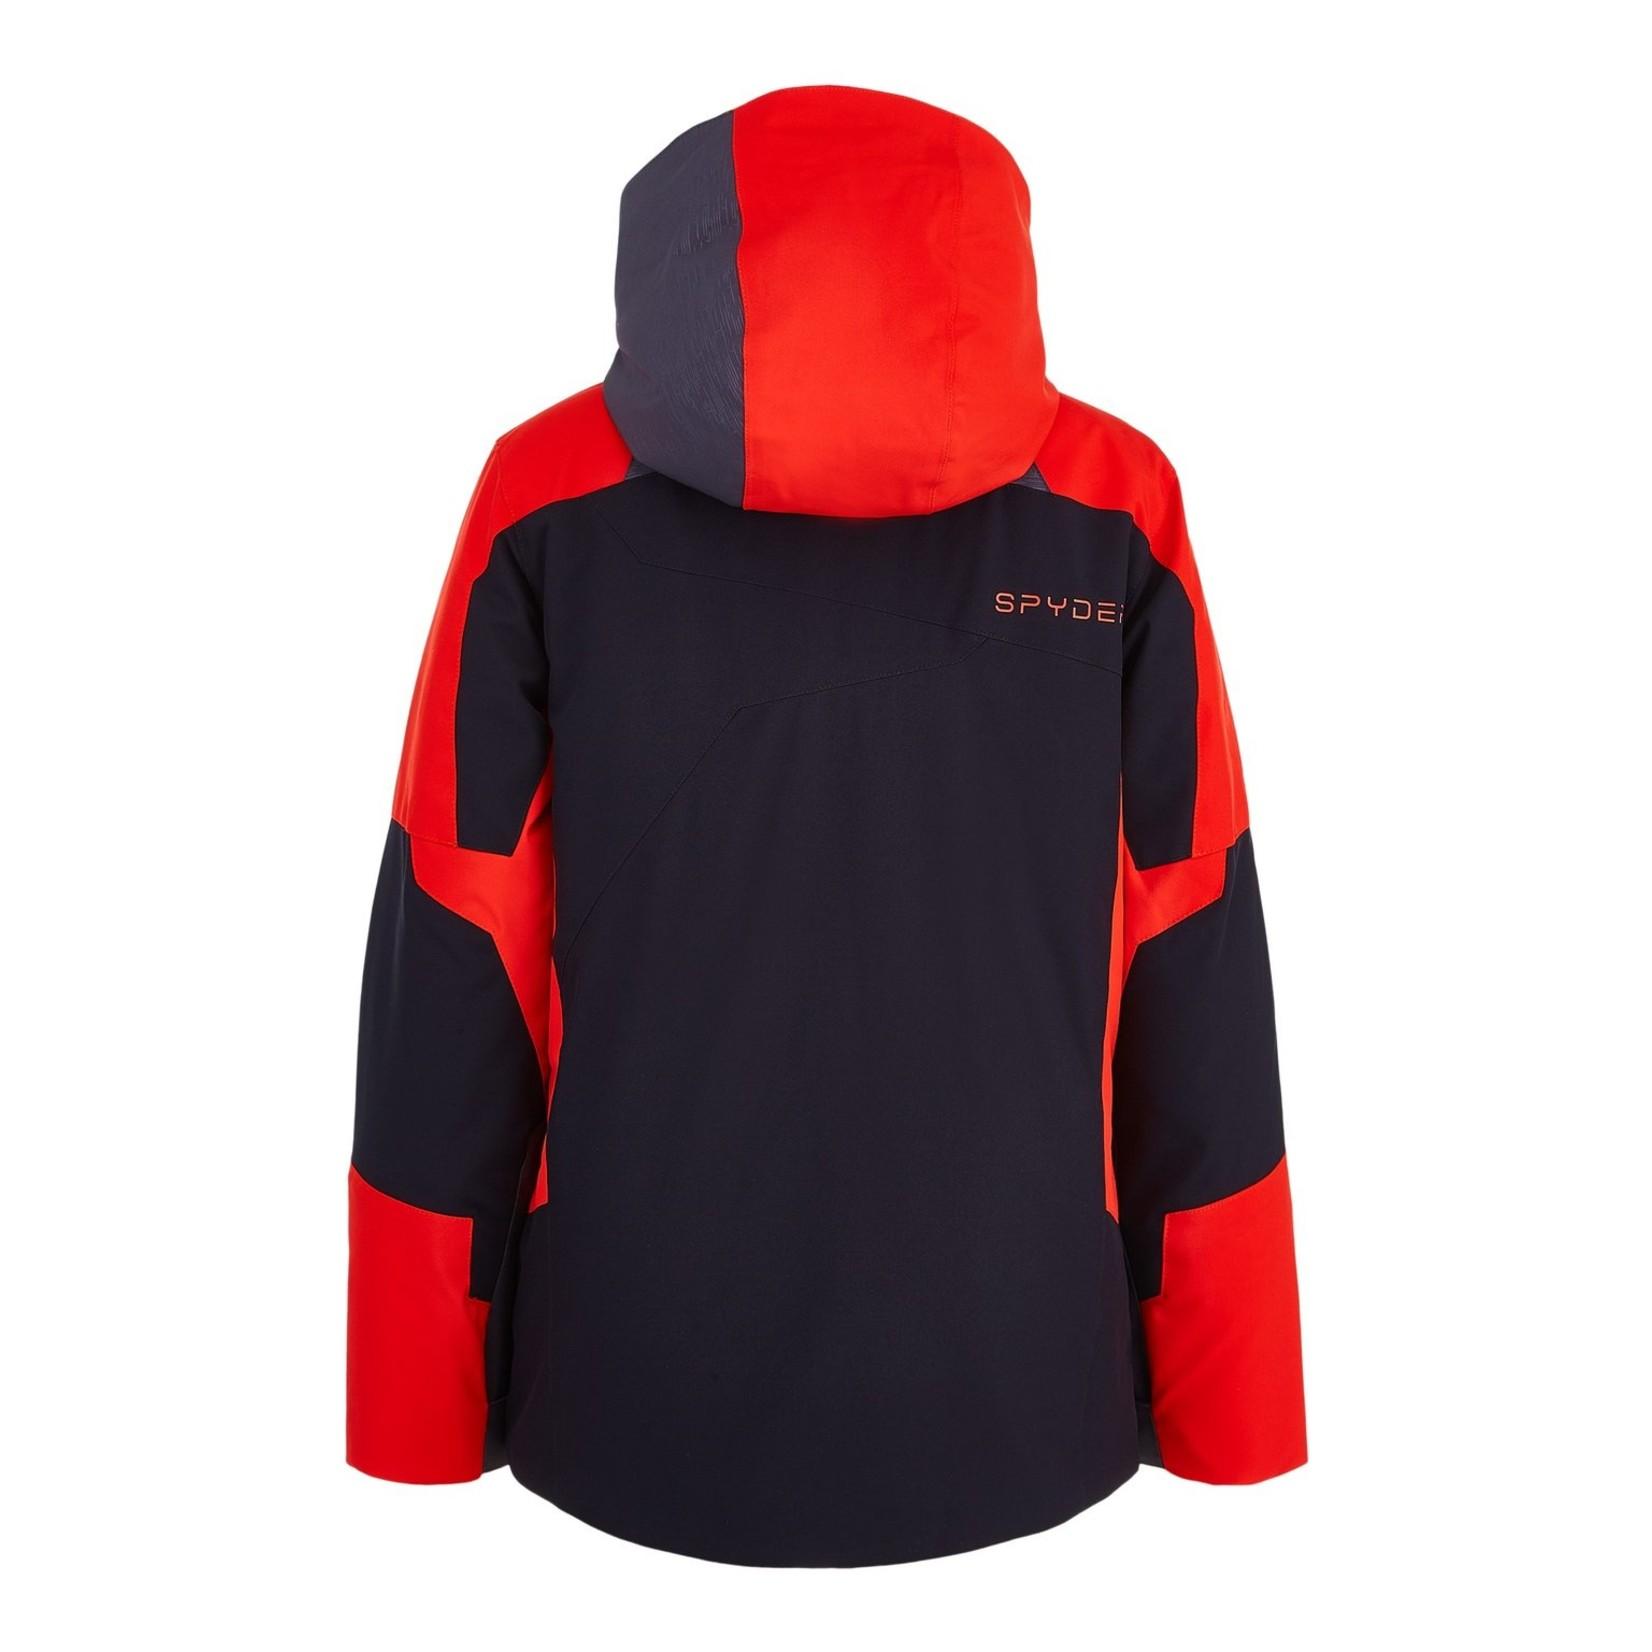 Spyder Spyder Boy's Leader Jacket